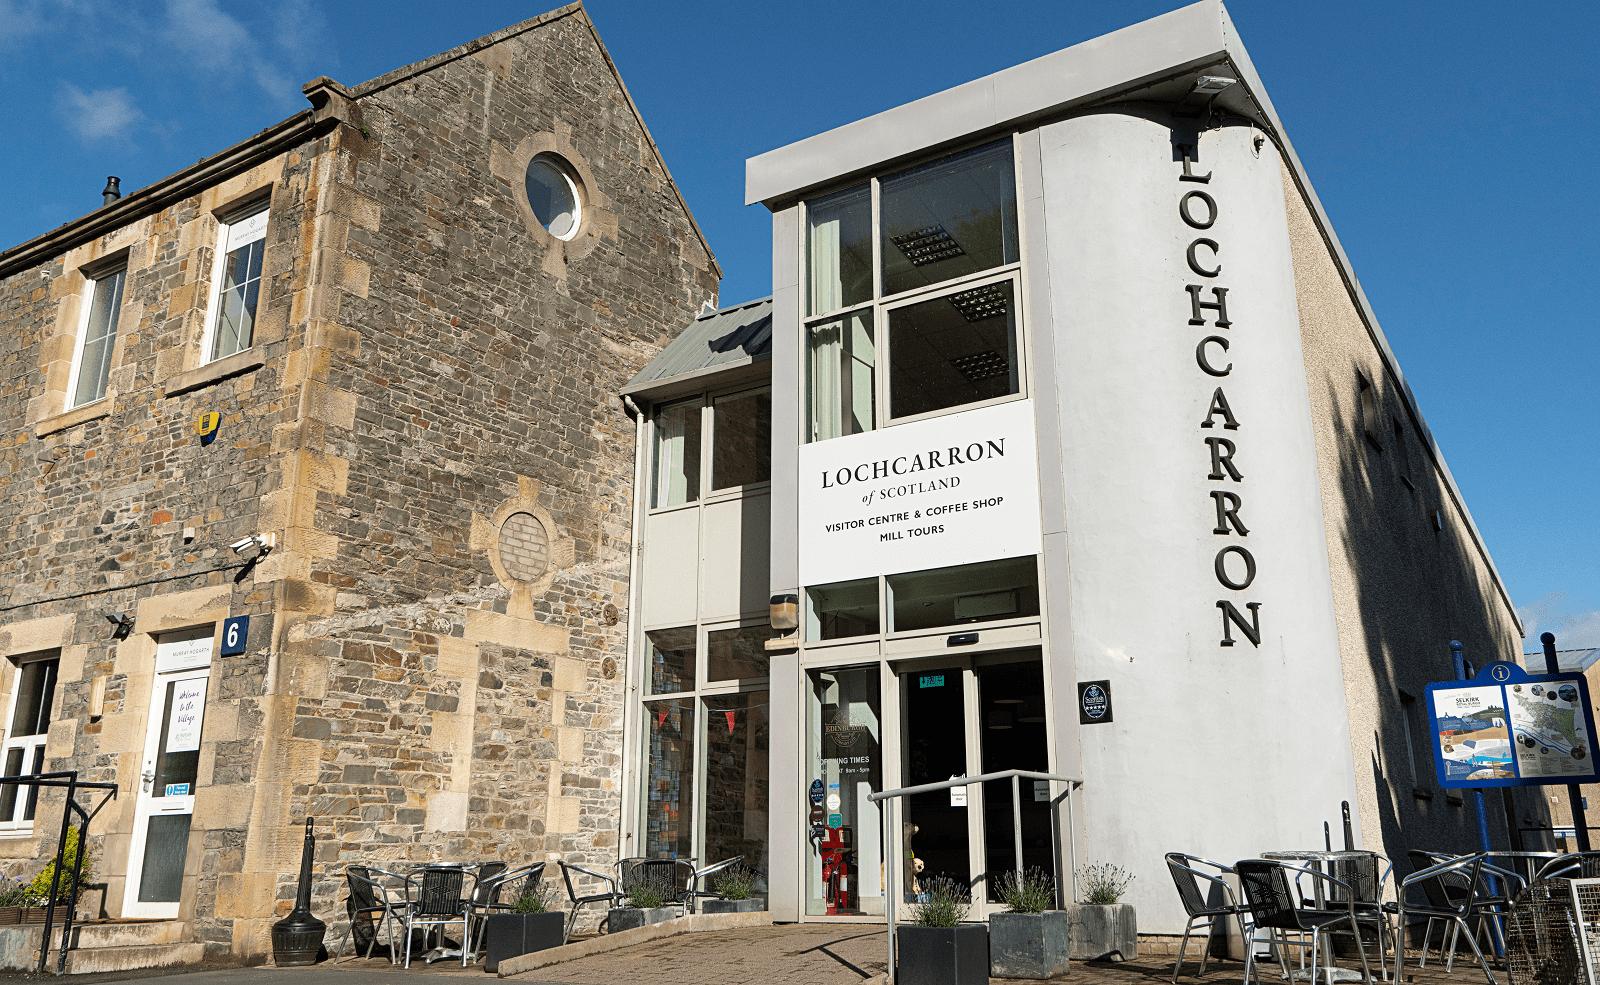 Lochcarron Visitor Centre Exterior